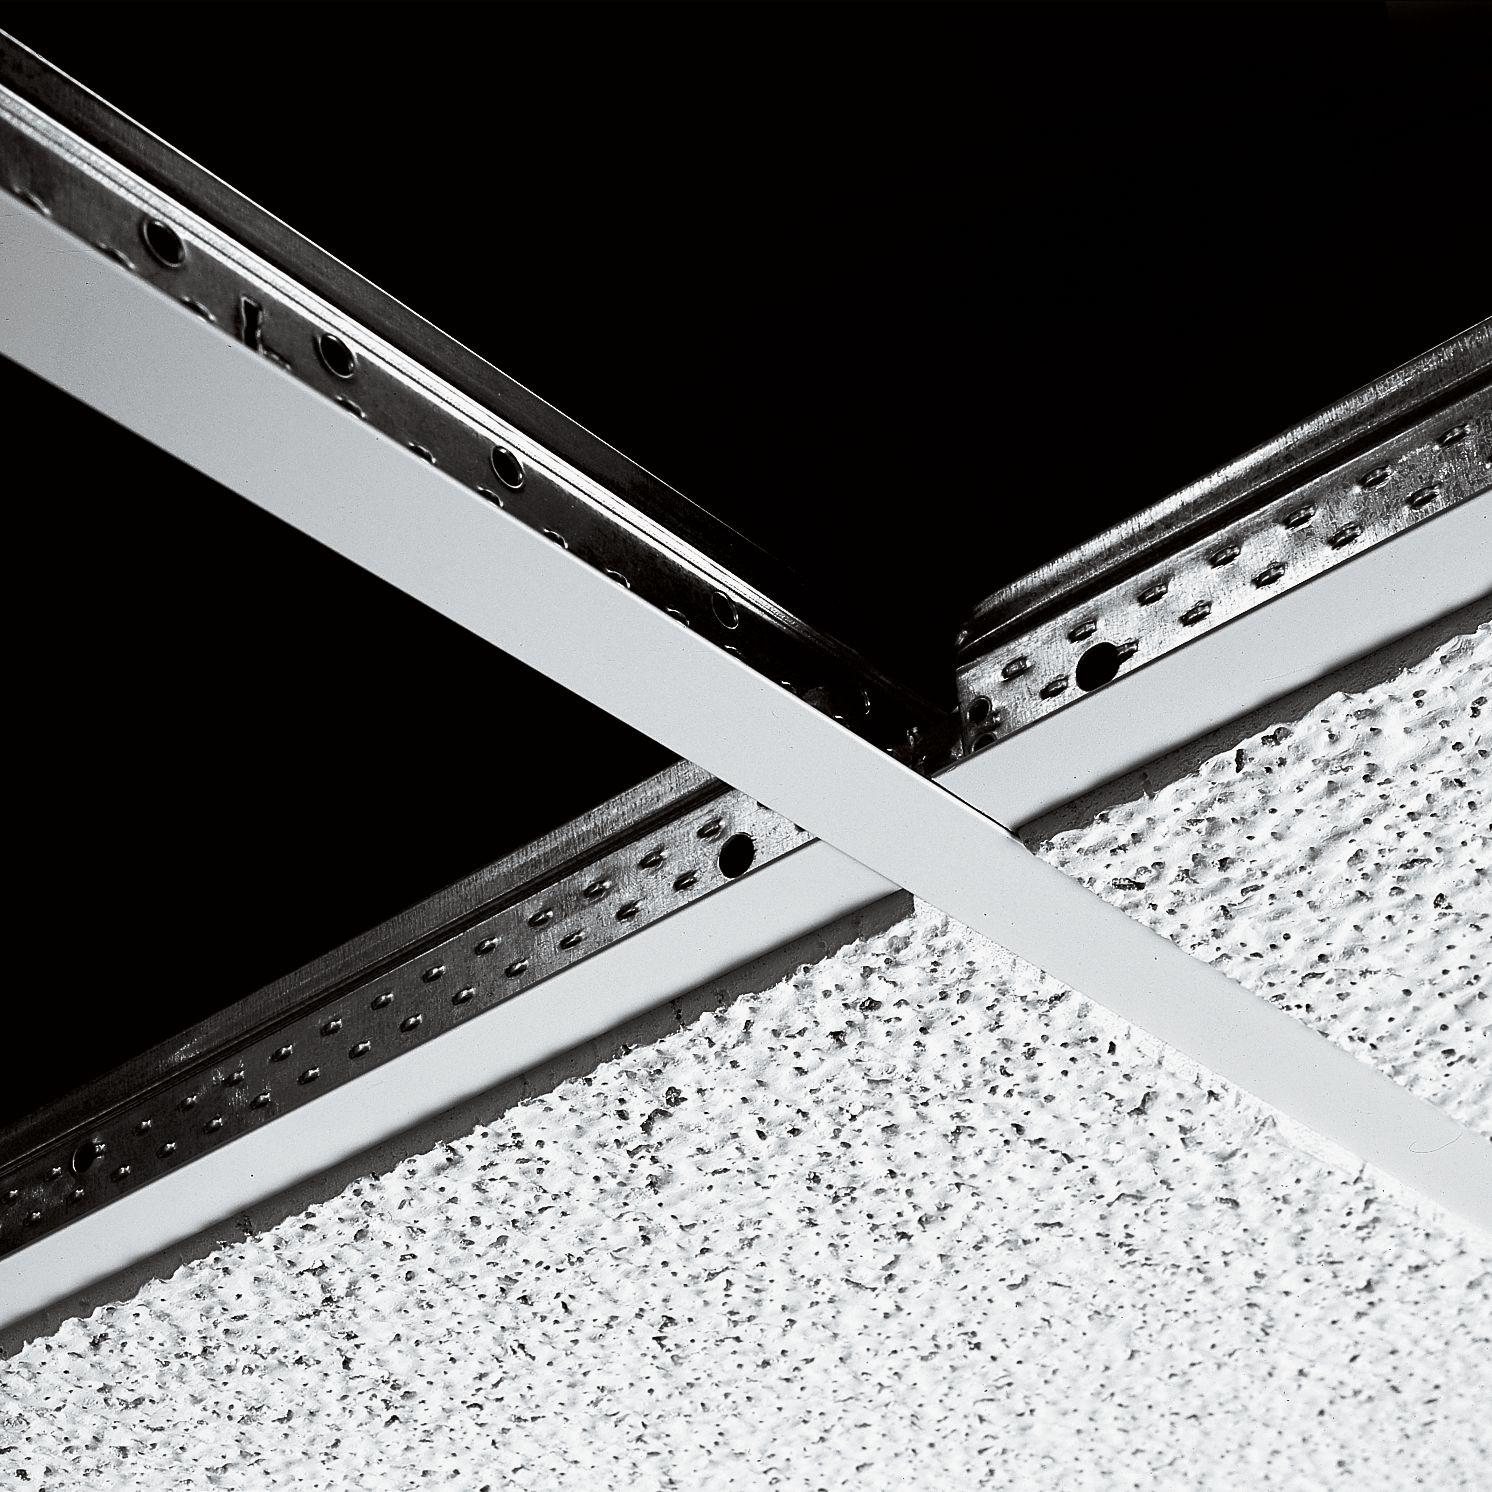 Cute 12 X 24 Floor Tile Huge 2 X 6 Subway Tile Rectangular 2X2 Ceramic Floor Tile 4X4 Tile Backsplash Youthful 4X4 White Ceramic Tile Bright6 X 12 Ceramic Tile Suspended Ceiling Systems | Armstrong Ceilings Residential